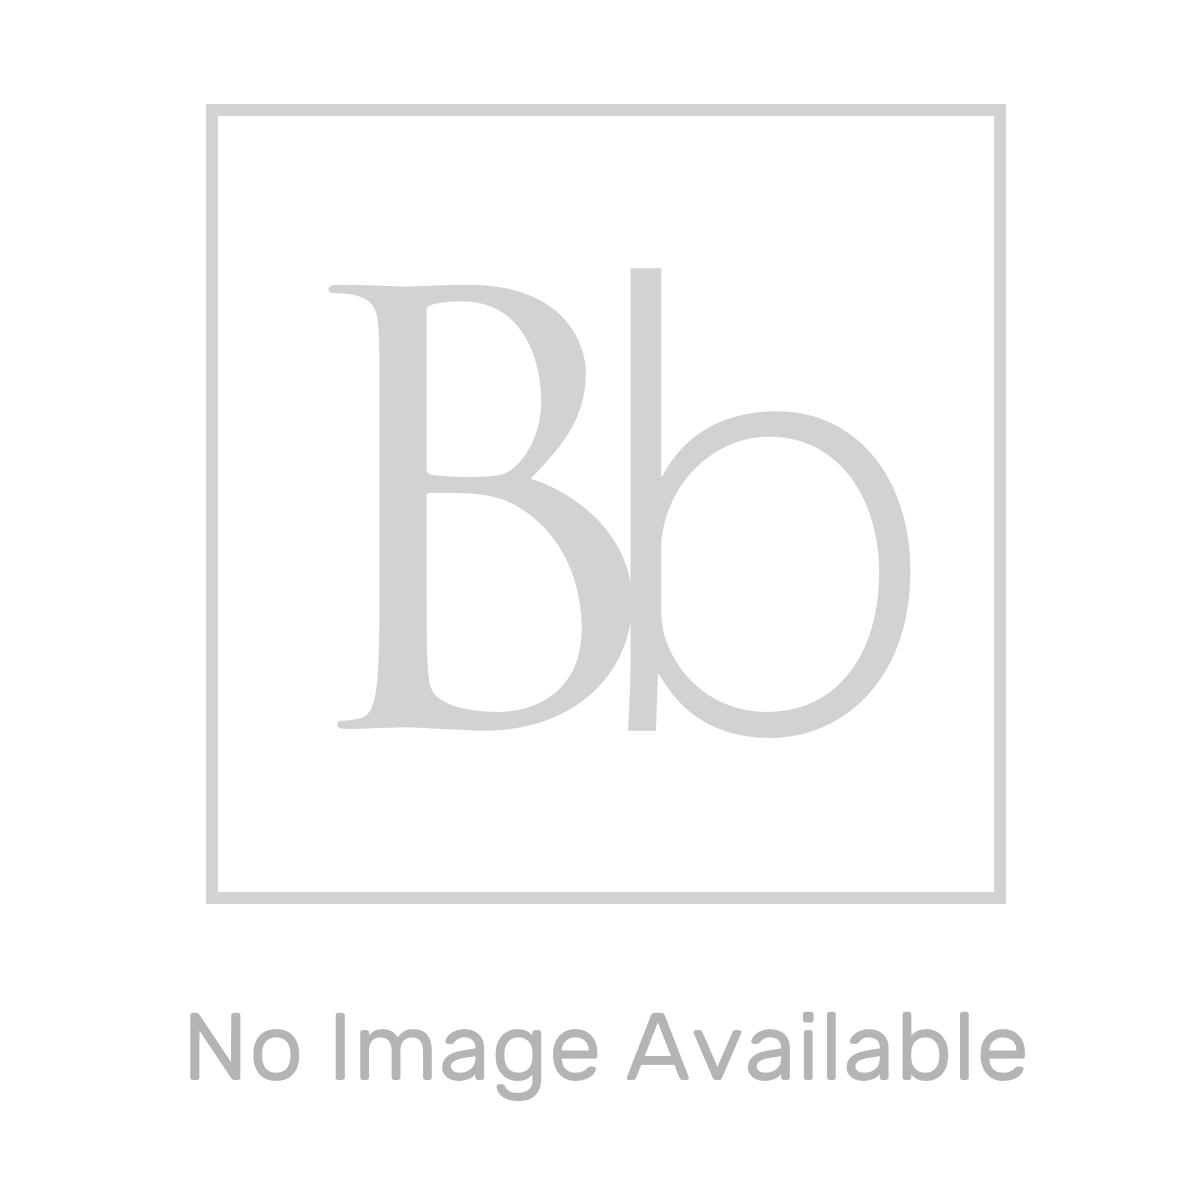 RAK Feeling Black Rectangular Shower Tray 1700 x 700mm